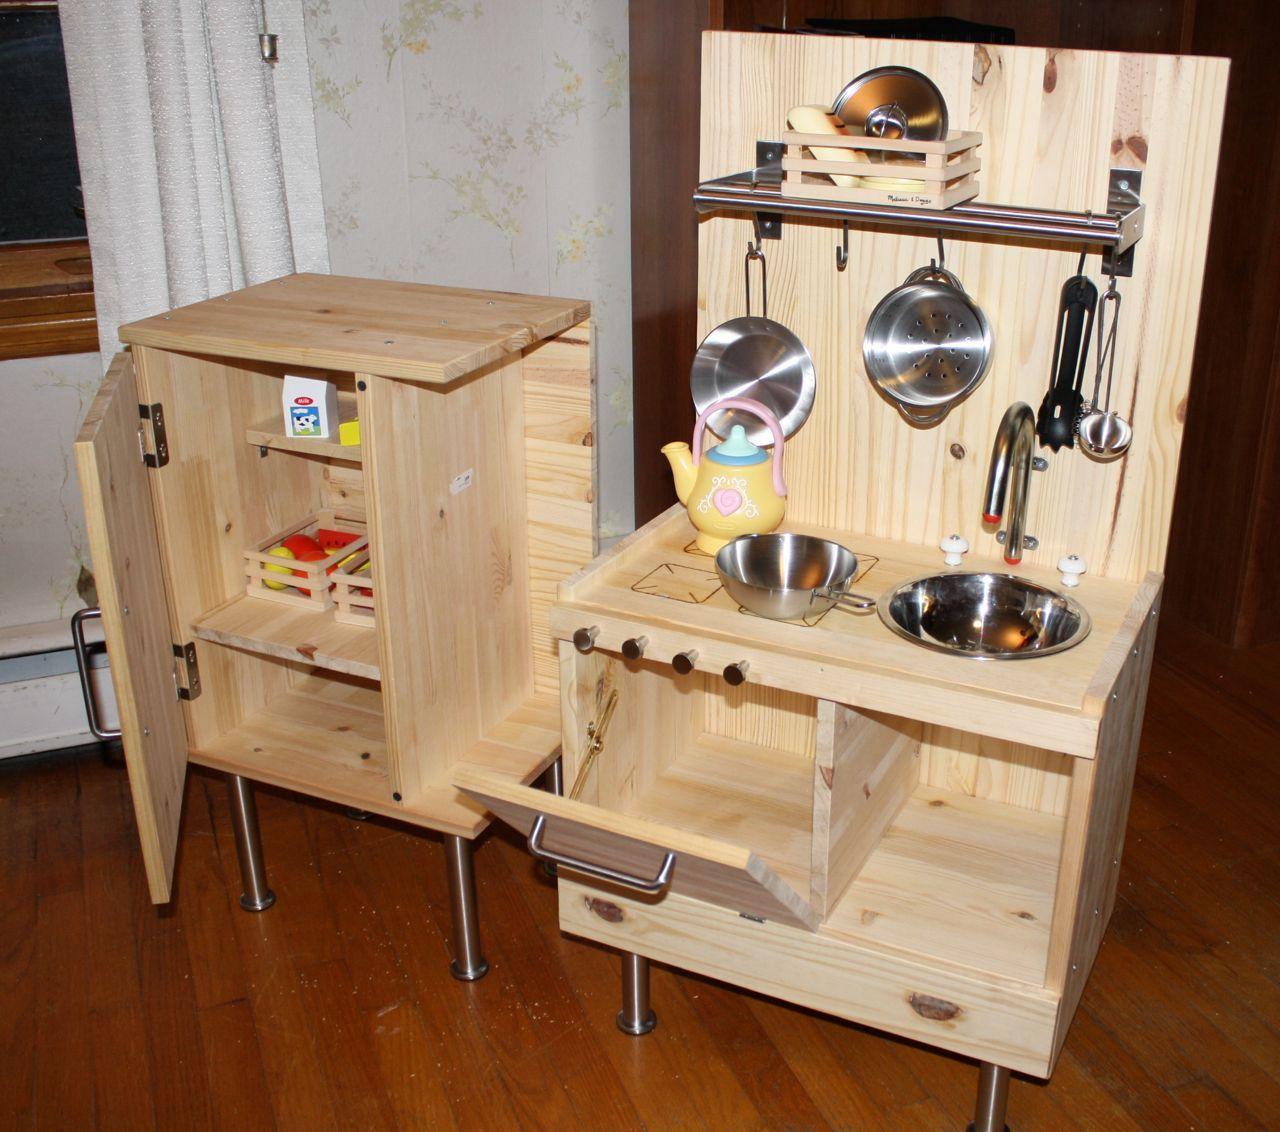 Rate Kitchen Set: Play Kitchen Set: Materials: RAST Nightstand, GRUNDTAL